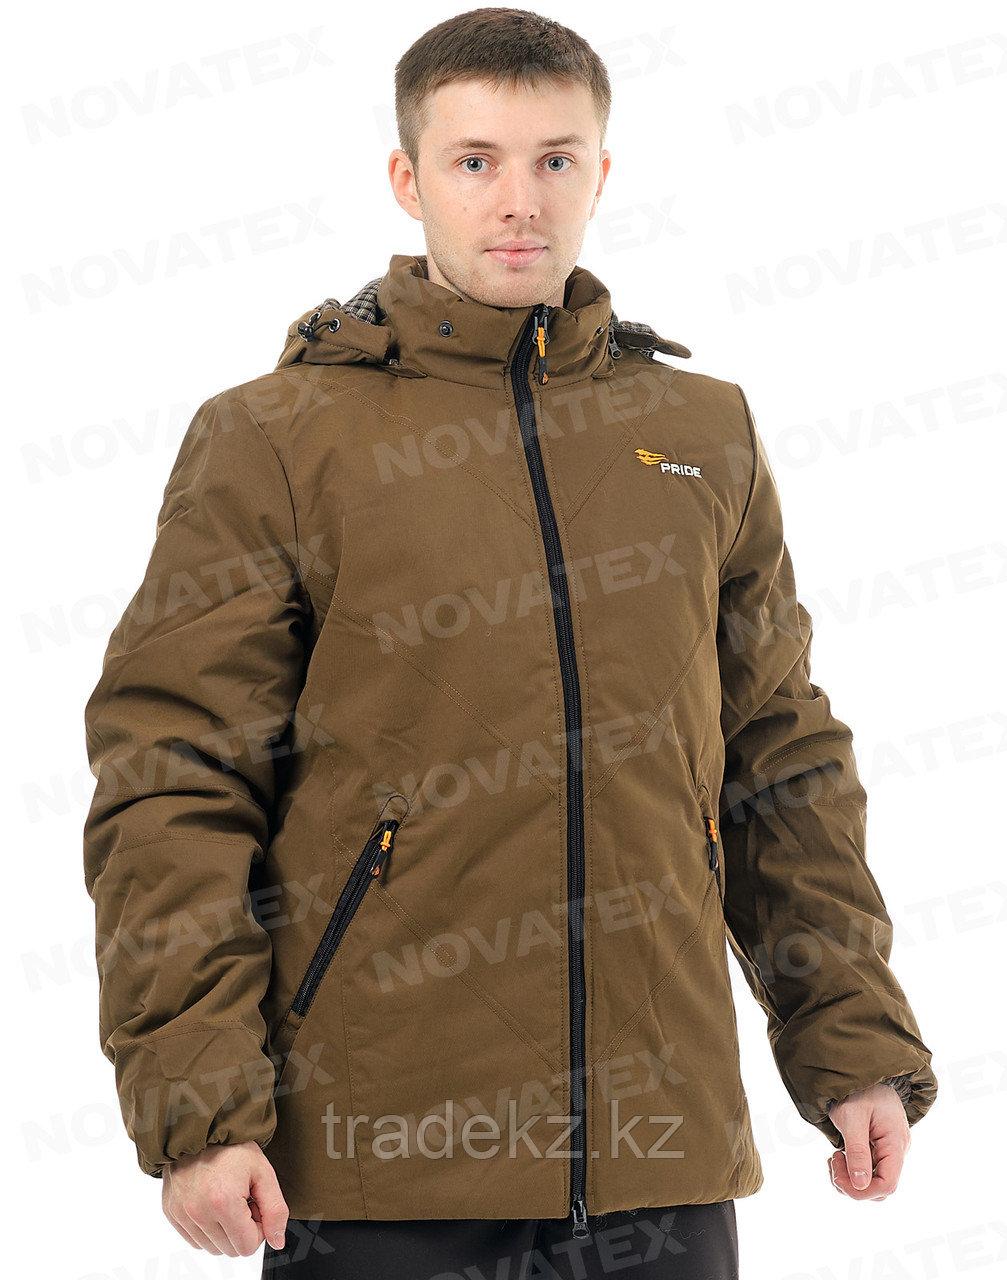 Куртка, парка зимняя Novatex Таганай (ткань граф, коричневый), размер 44-46